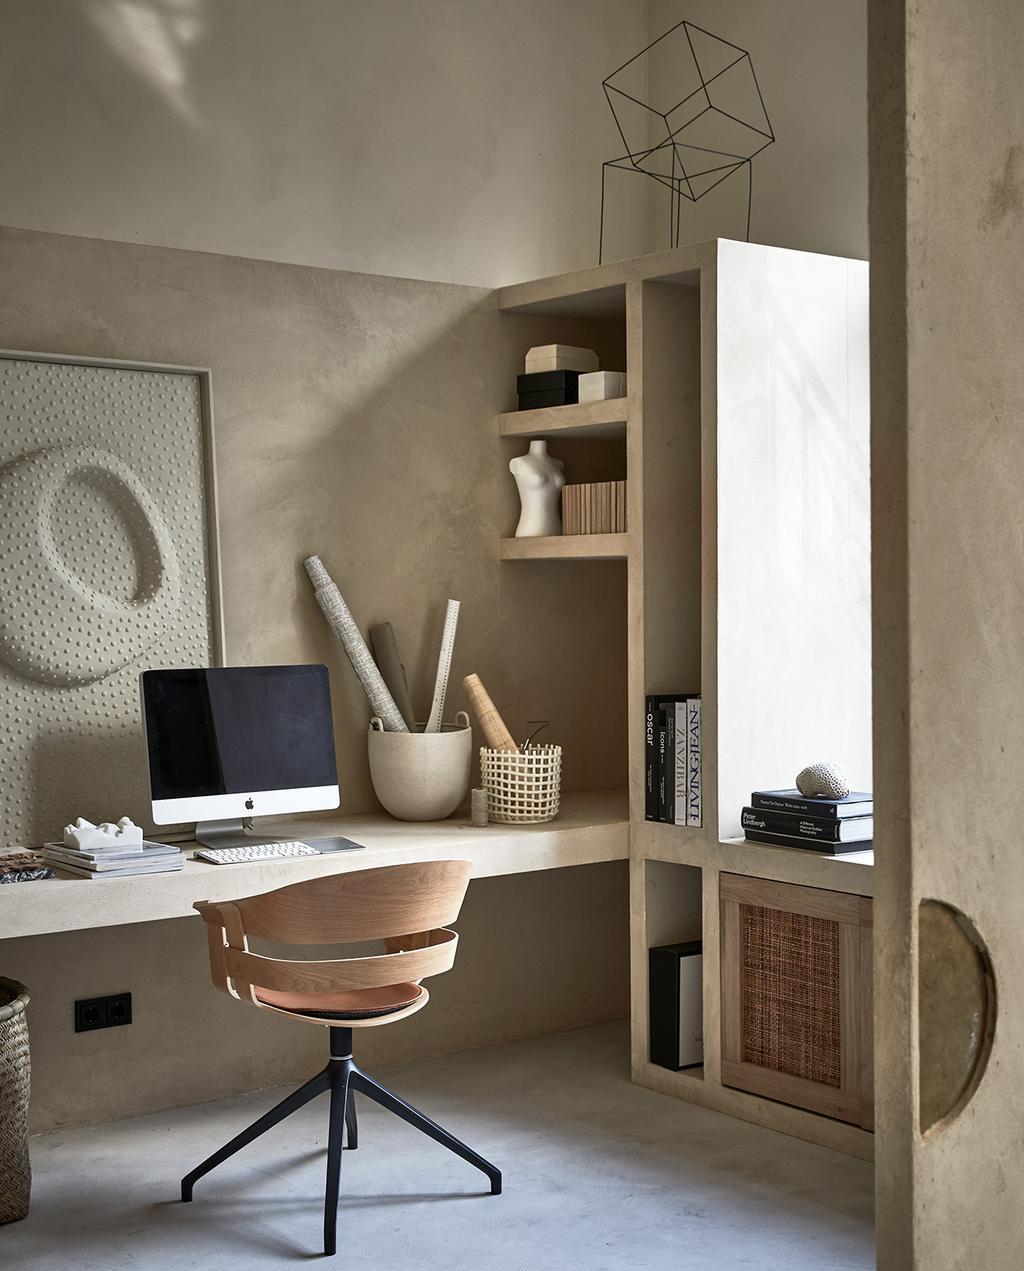 vtwonen 04-2021 | ingebouwde bureau in vakkenkast met thuiswerkplek